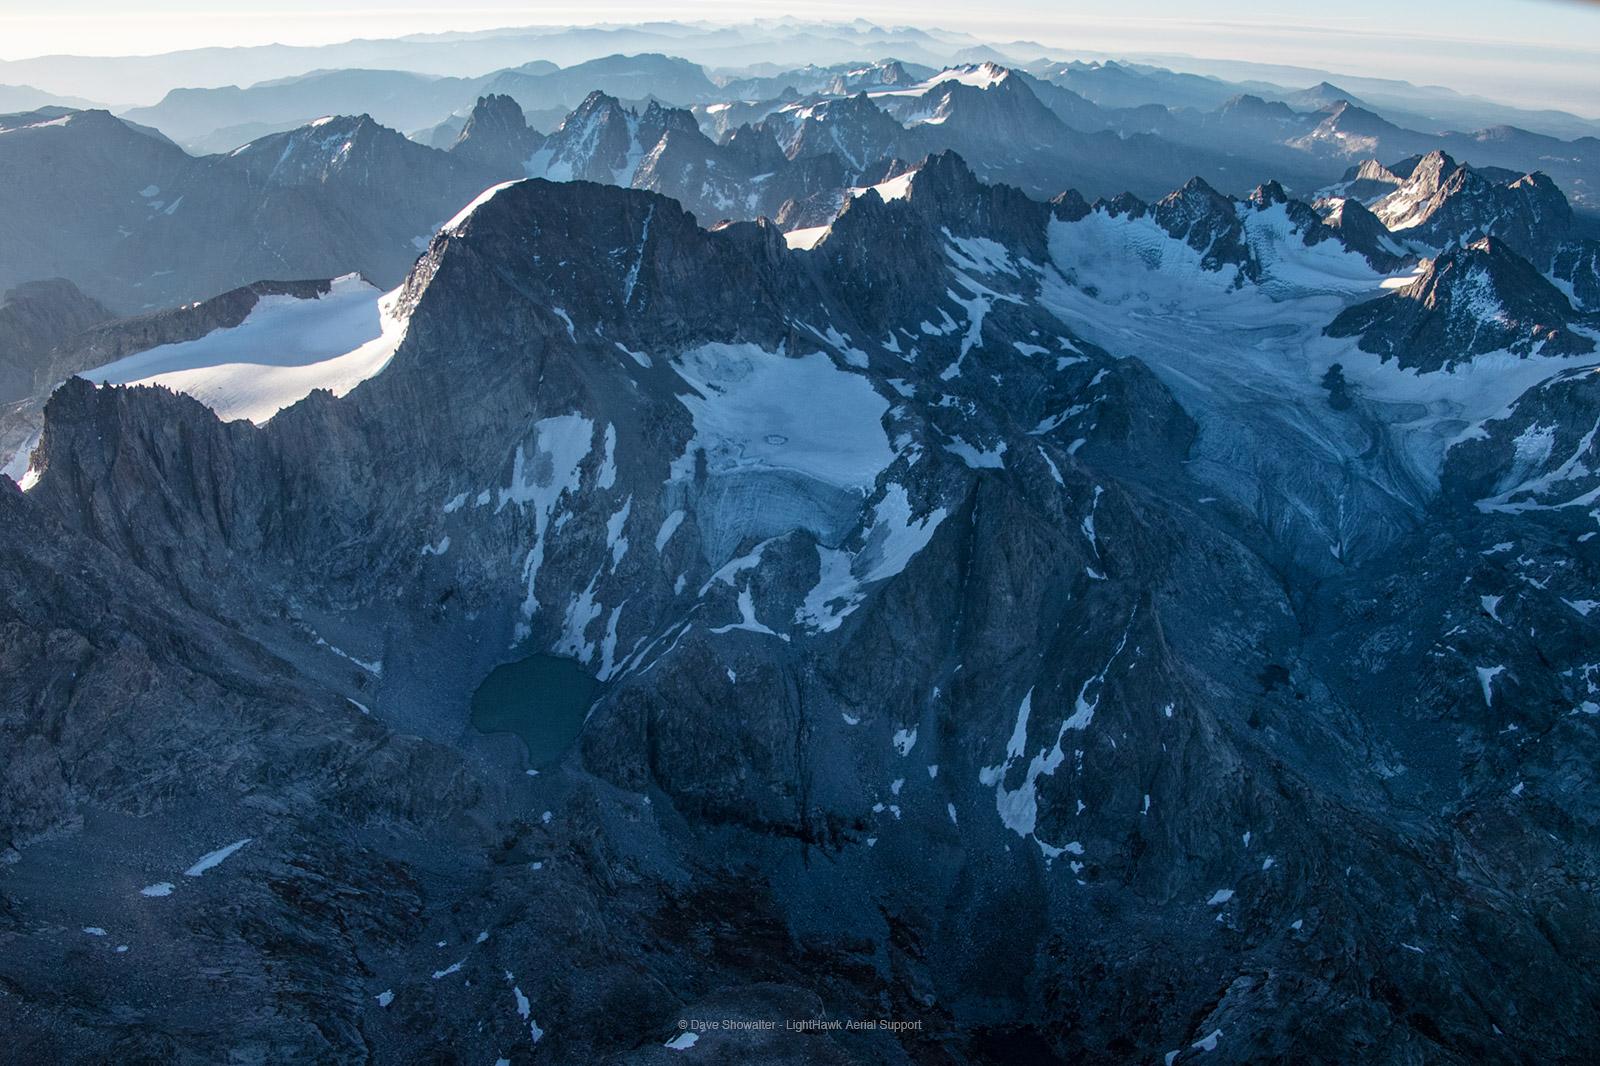 gannet peak, wind river range, photo